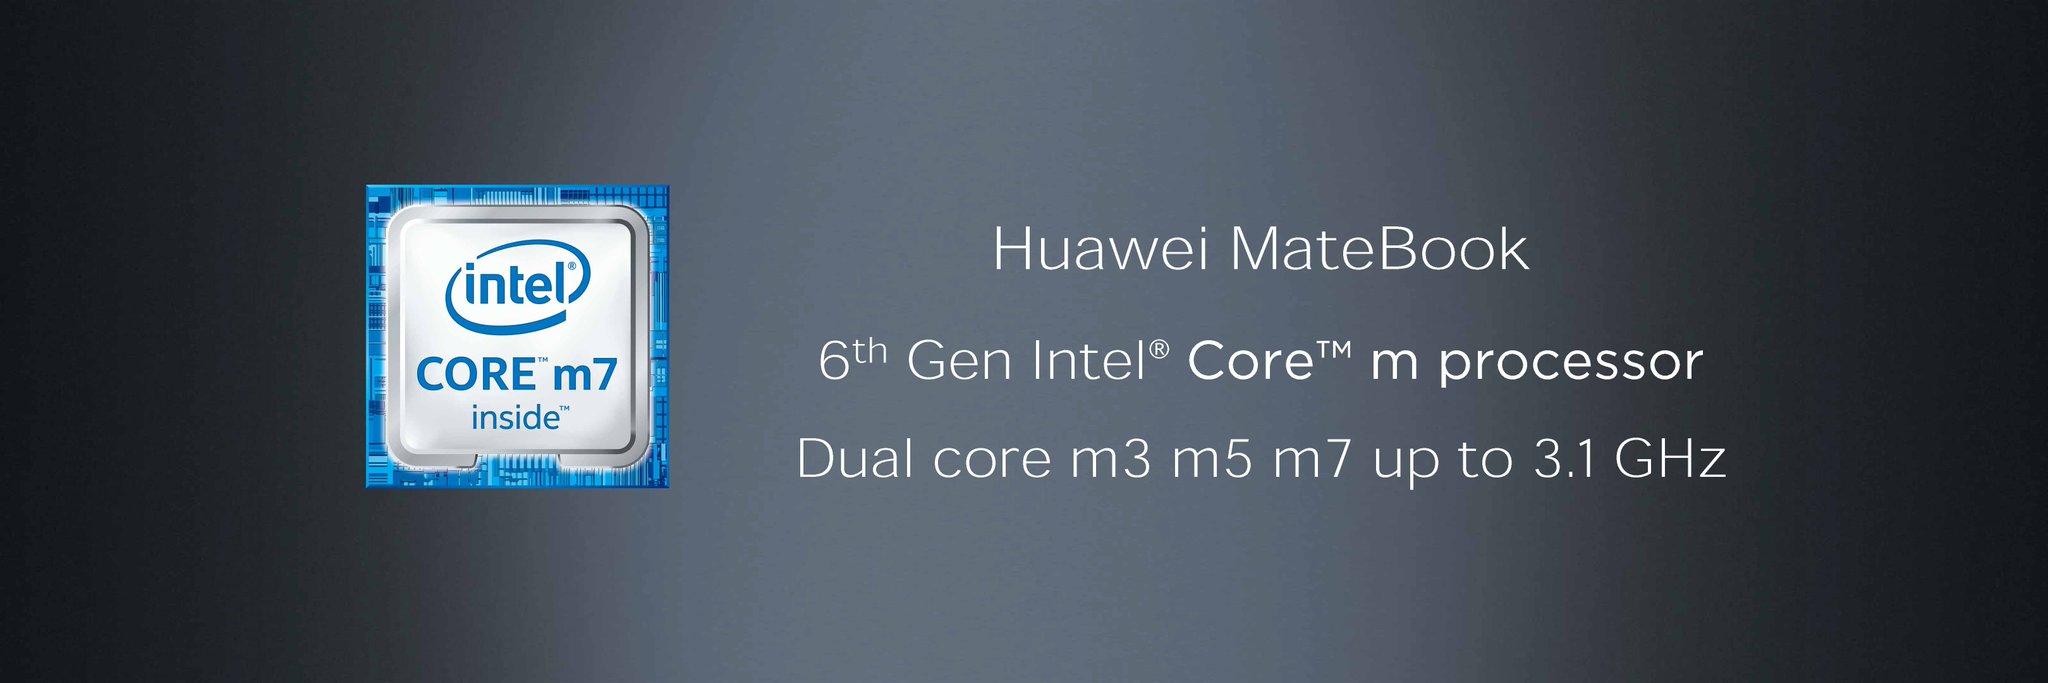 huawei matebook procesor